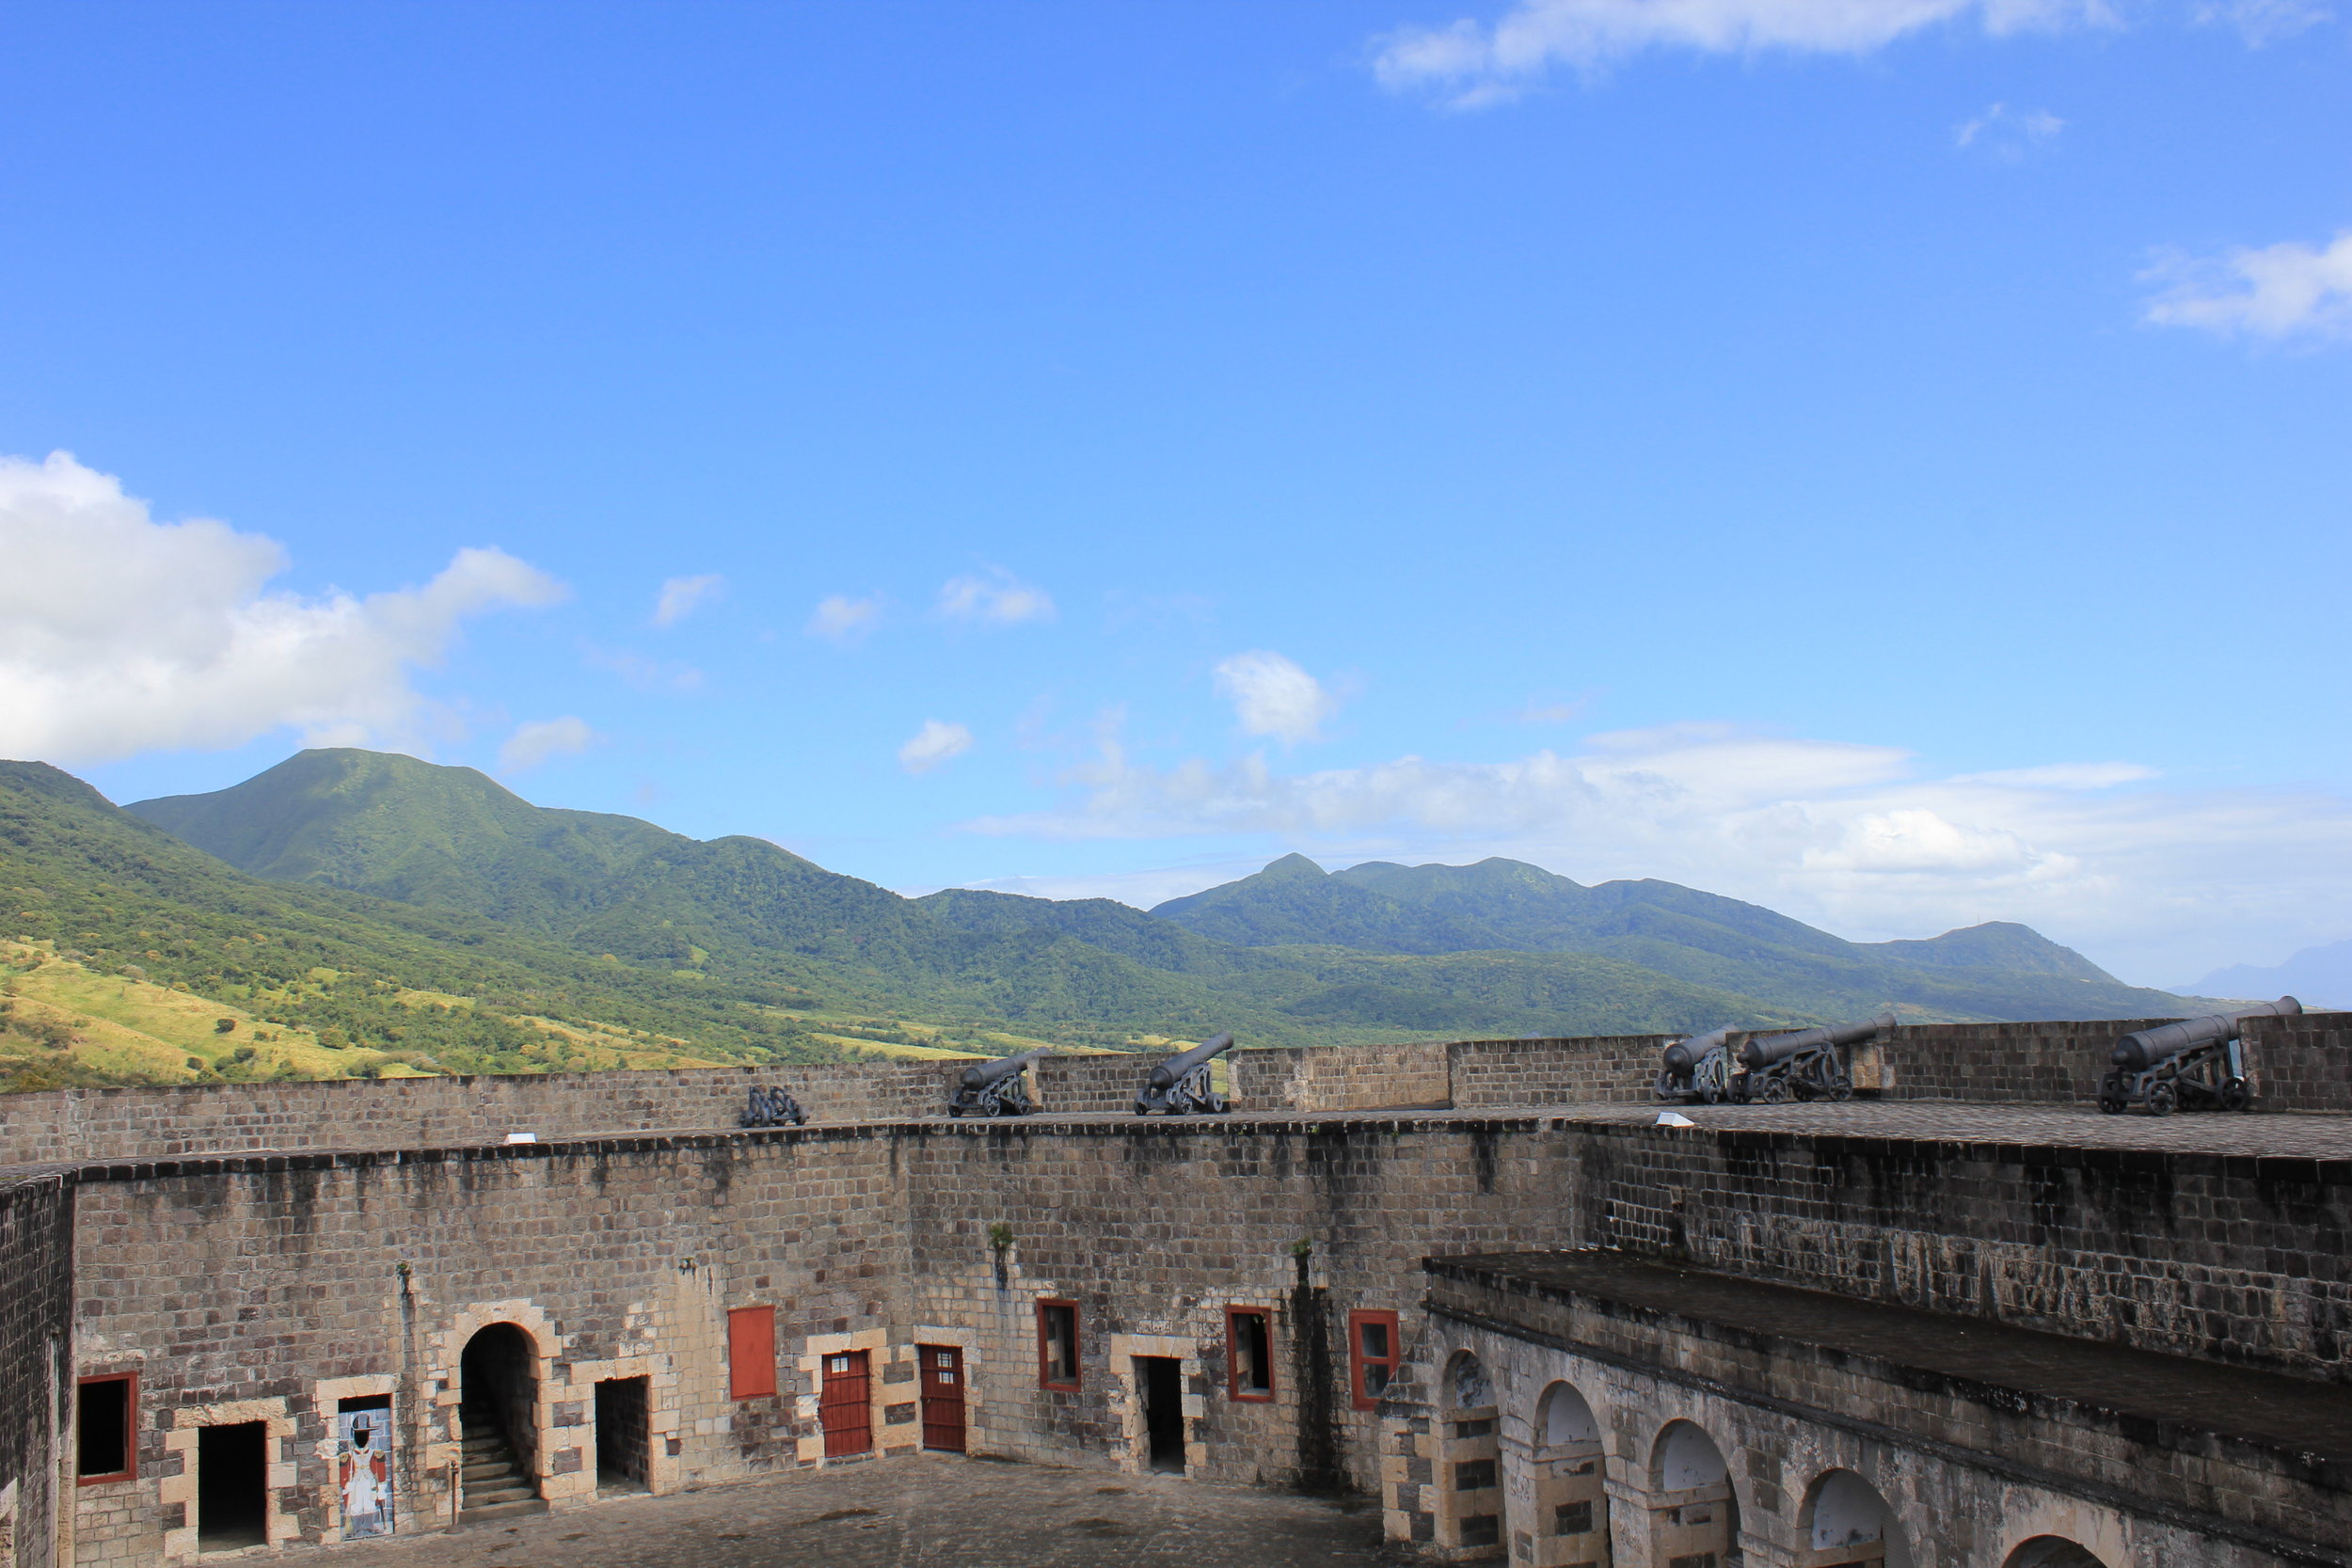 Brimstone Hill Fortress National Park – Interior